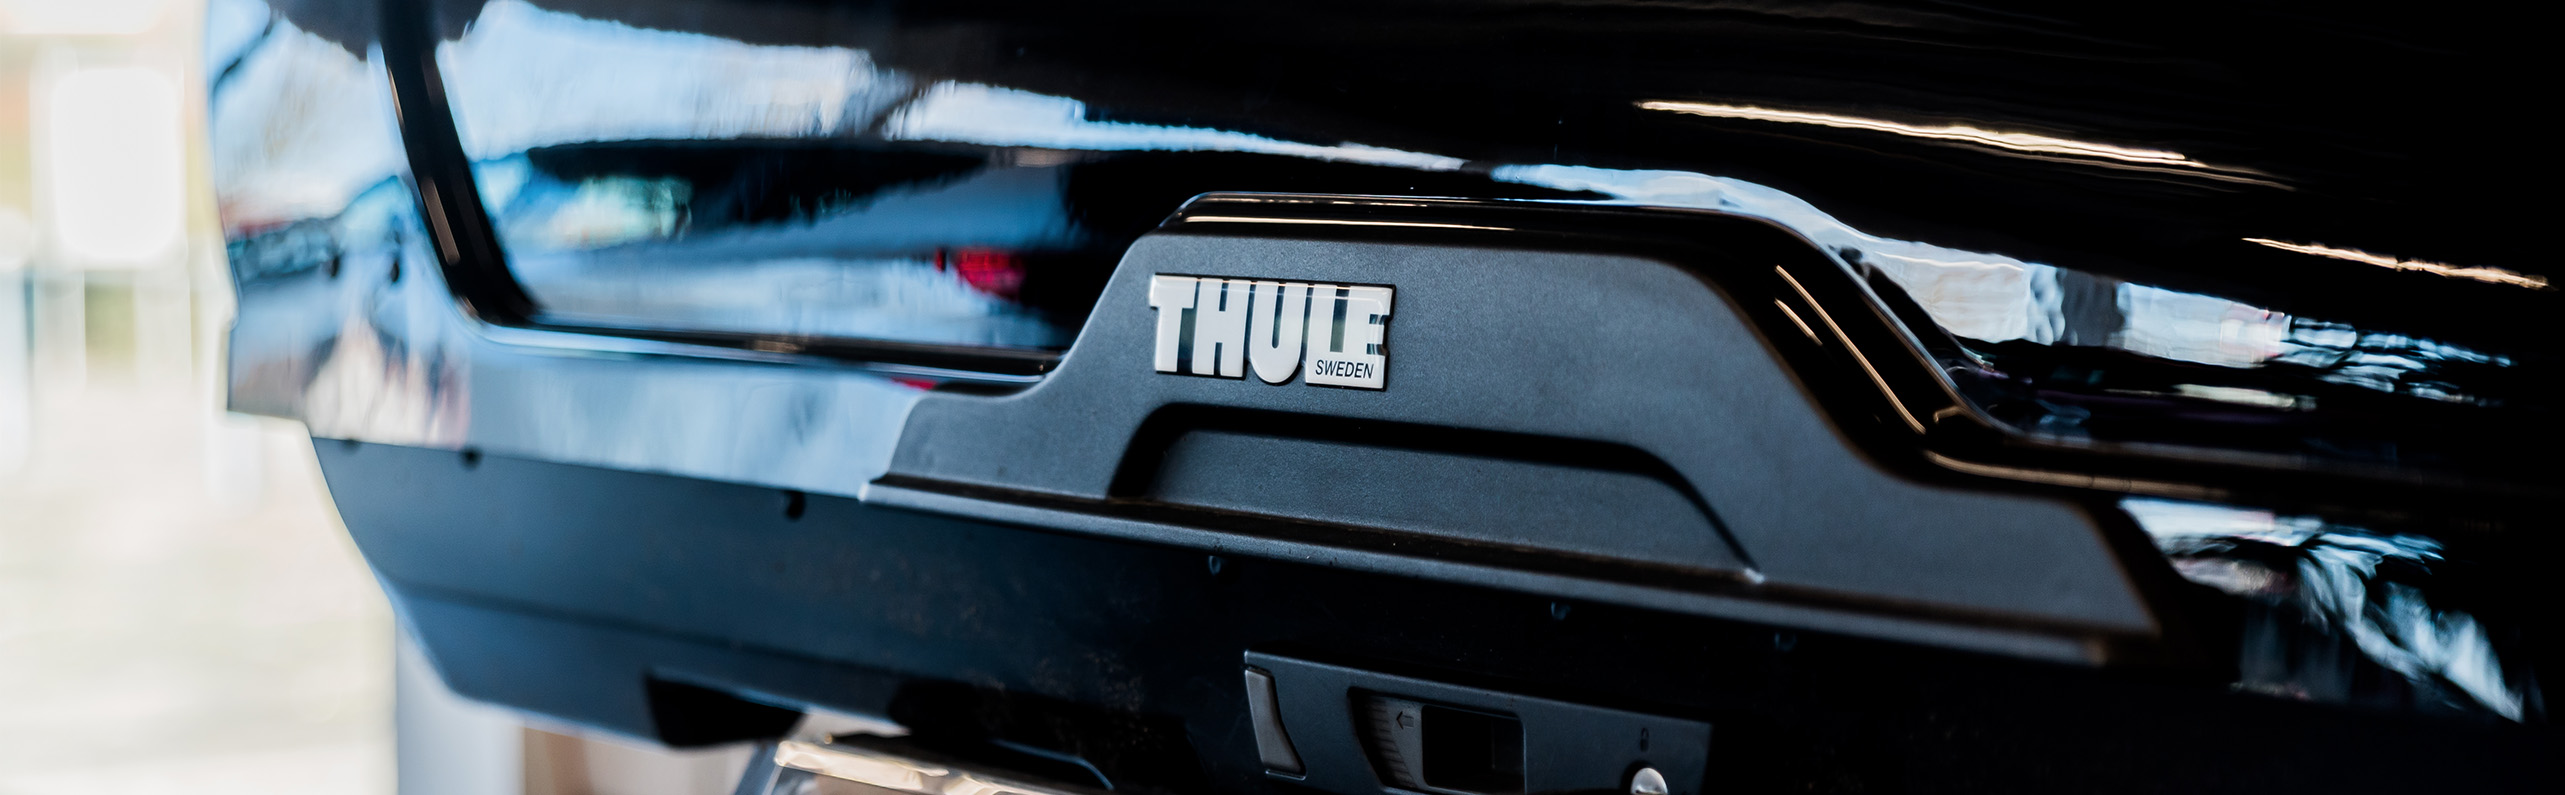 Dakkoffer monteren Kees Roks autobedrijf Roosendaal